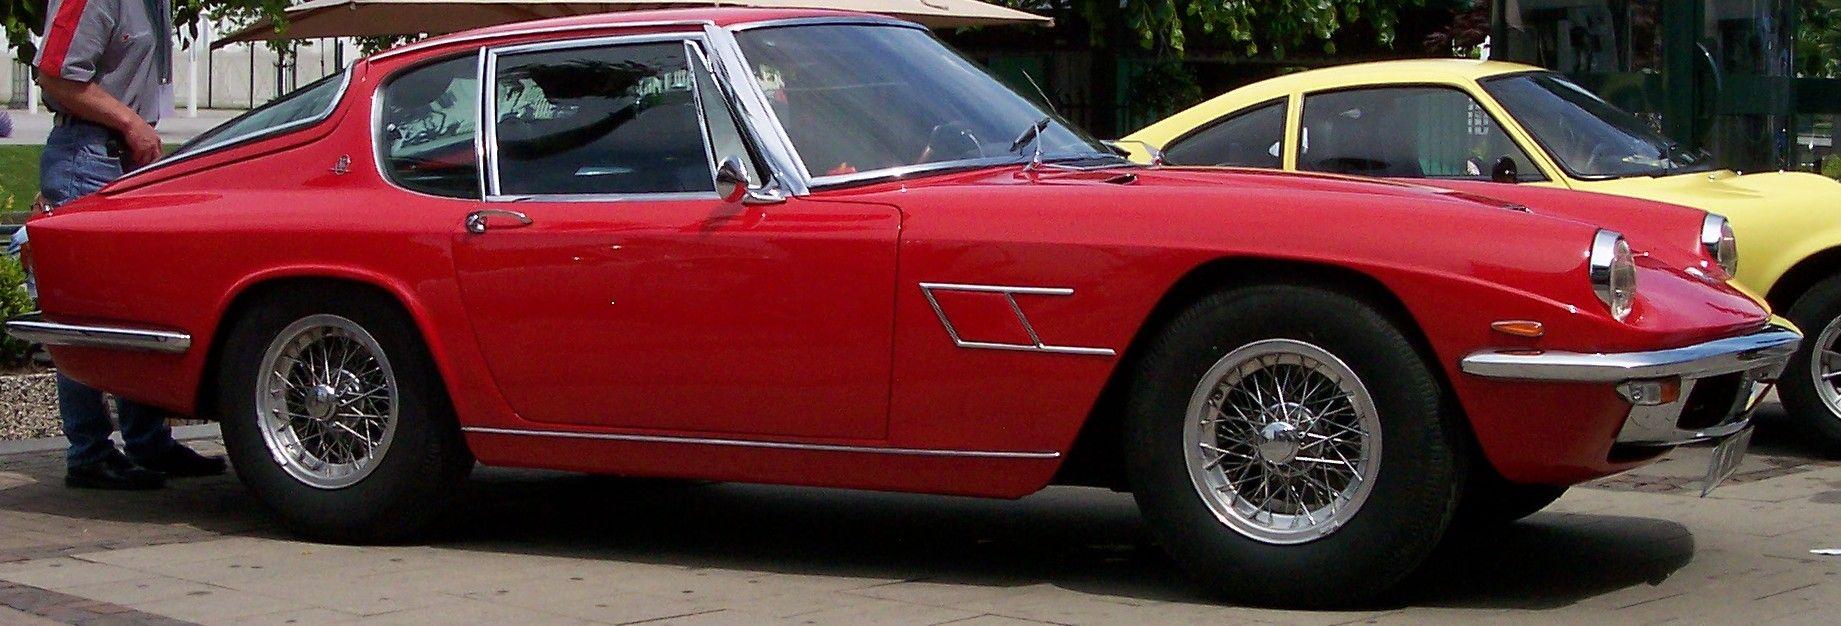 Maserati Mistral   Maserati, Maserati car, Model